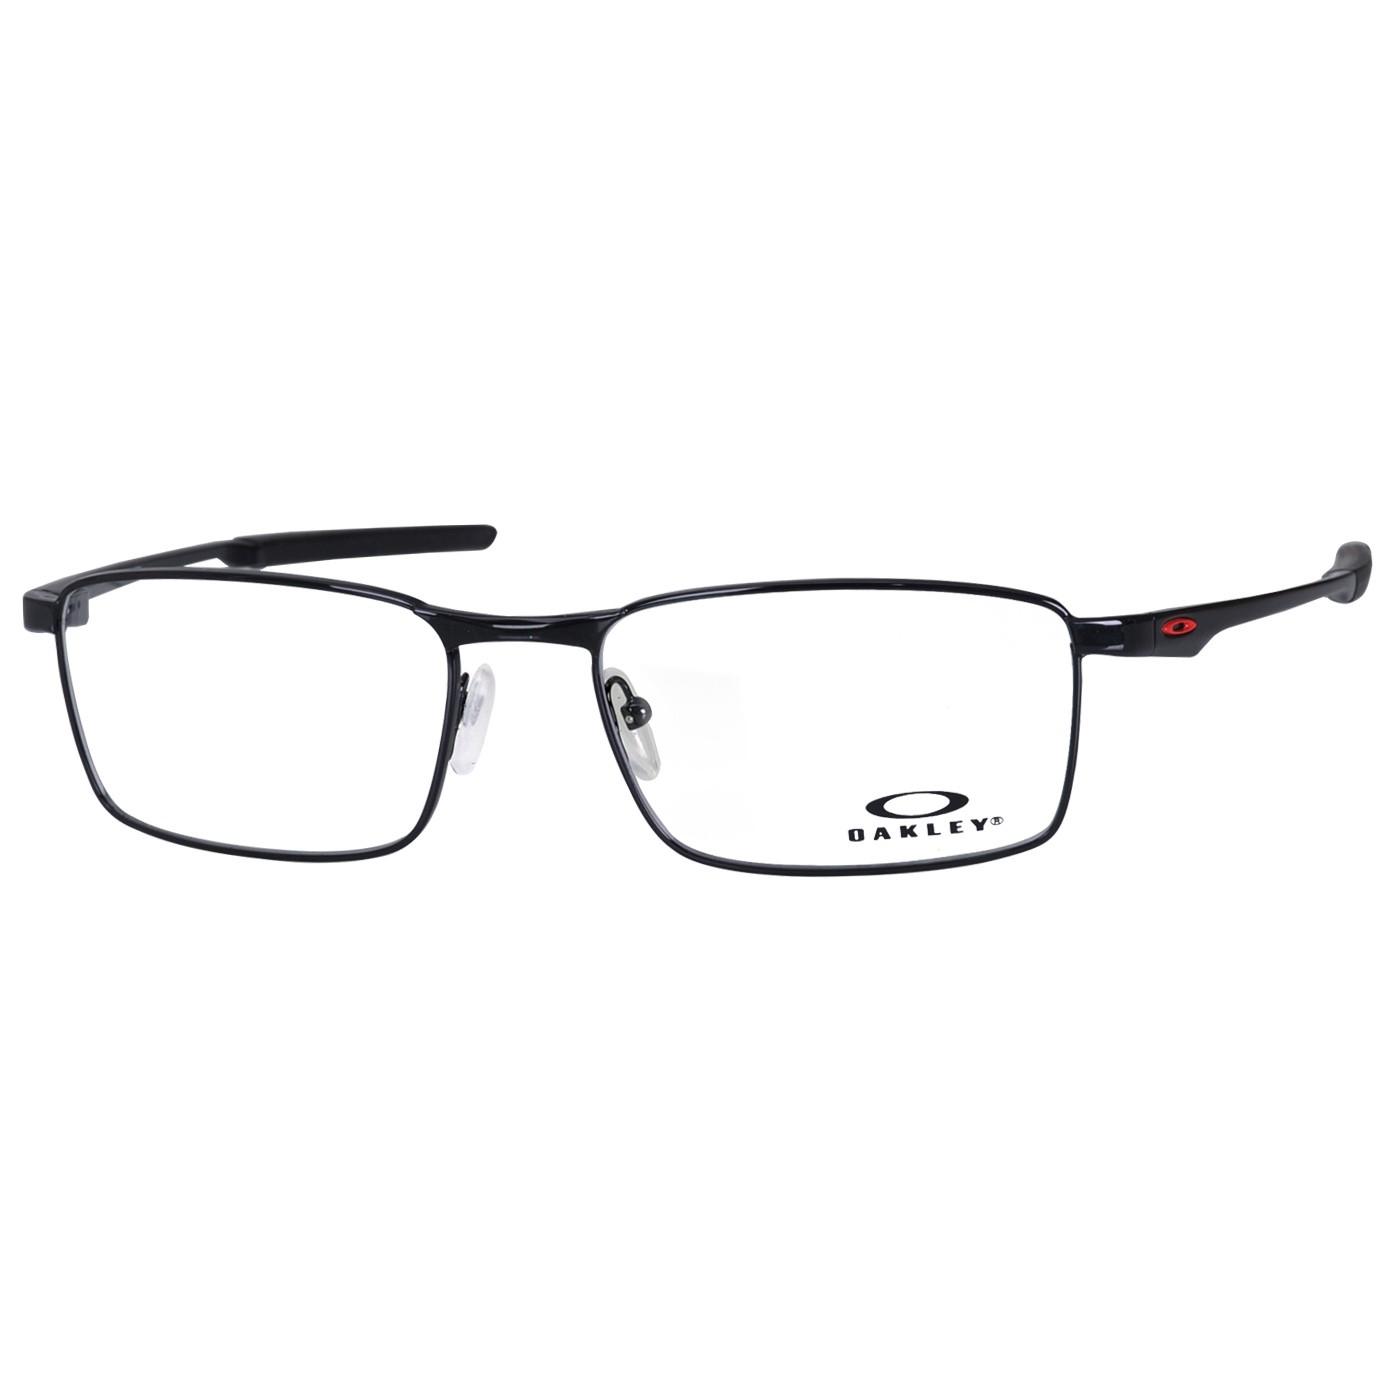 Armação de Óculos de Grau Oakley Fuller OX3227 Metal Preto Brilho